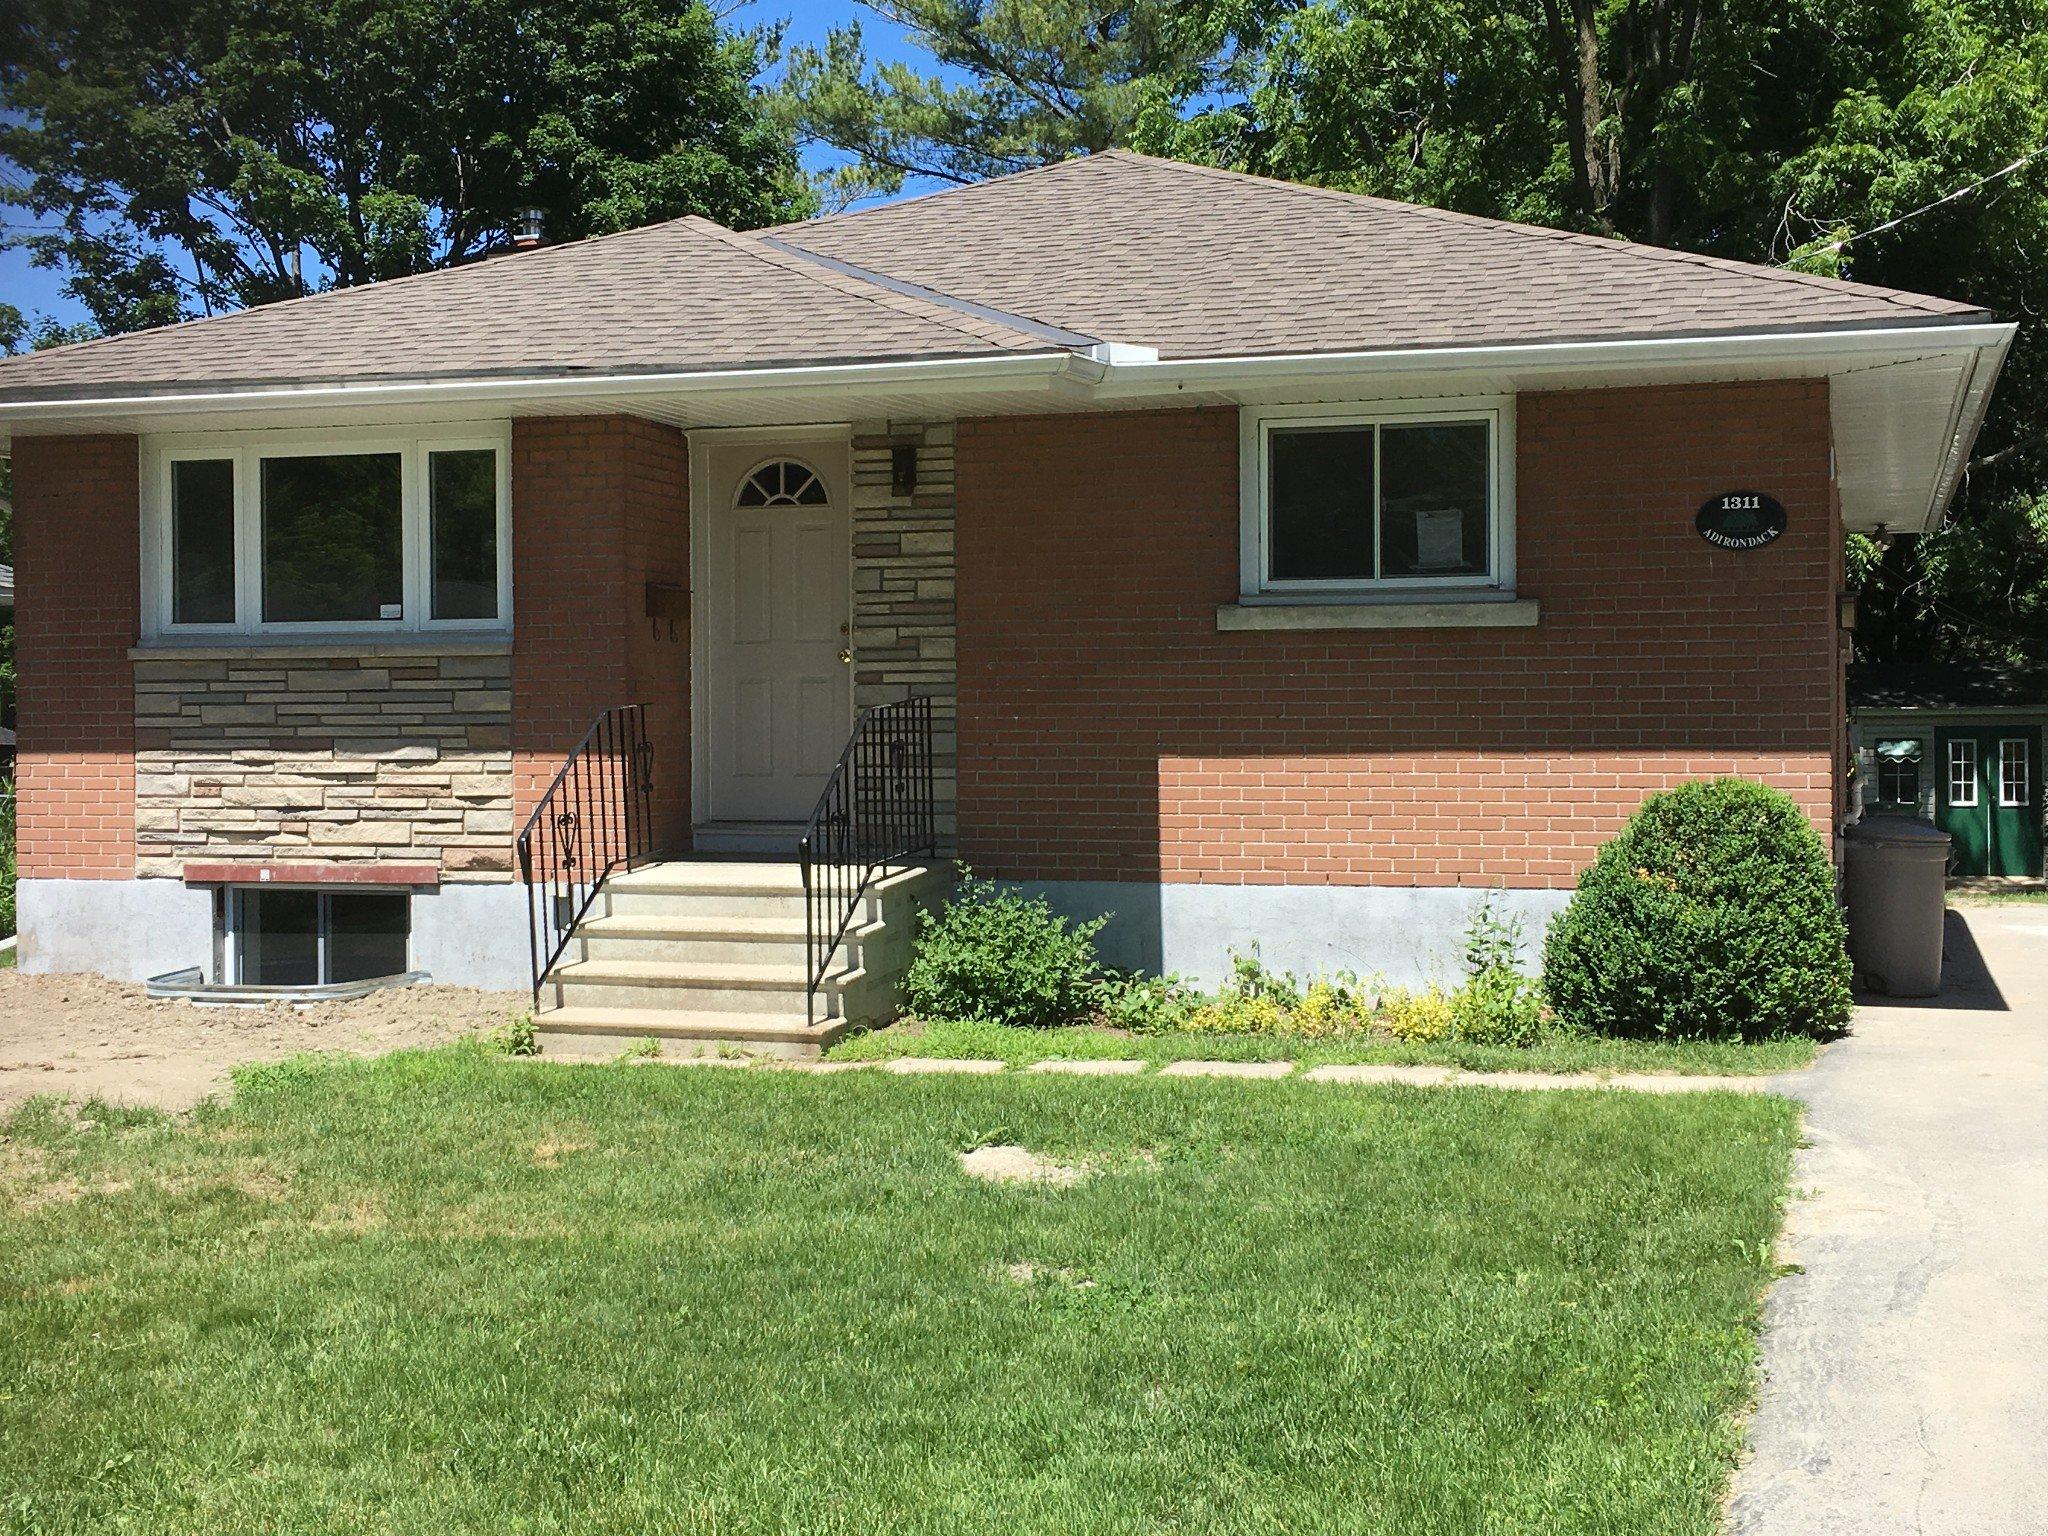 Main Photo: 1311-A Adirondack in Ottawa: Kenson Park House for lease (Algonquin)